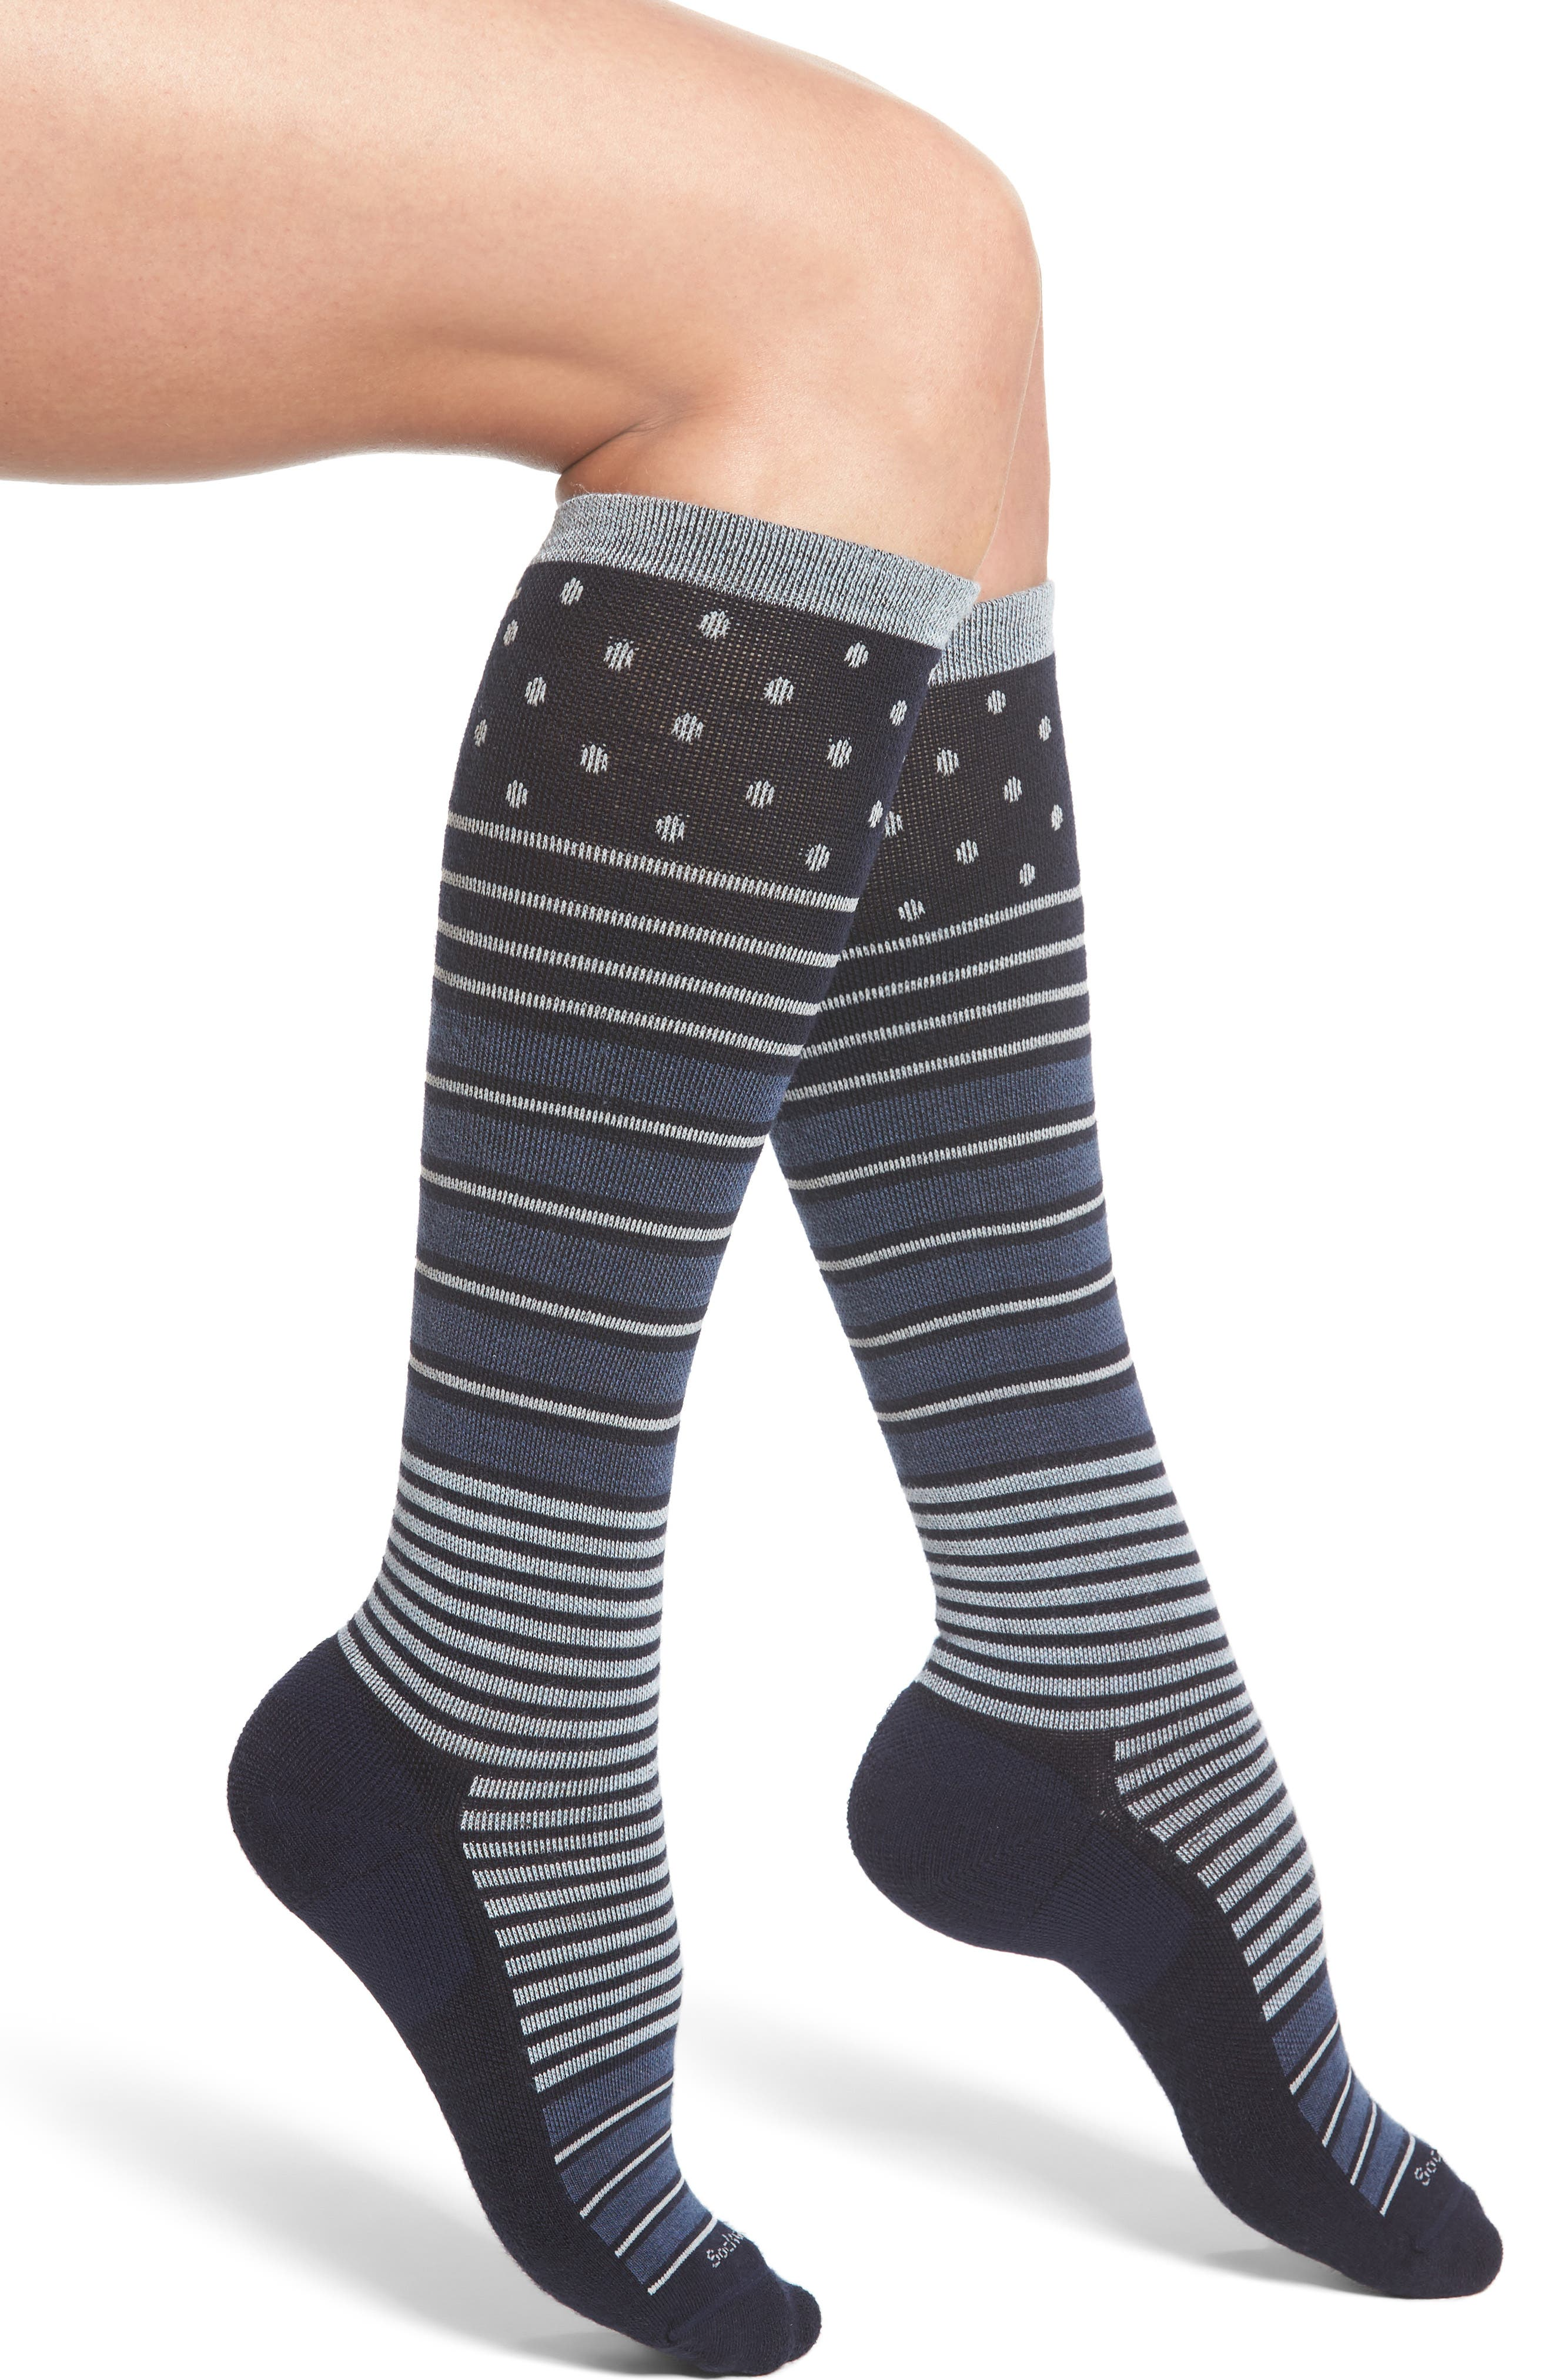 Main Image - Sockwell 'Twister' Merino Wool Blend Compression Socks